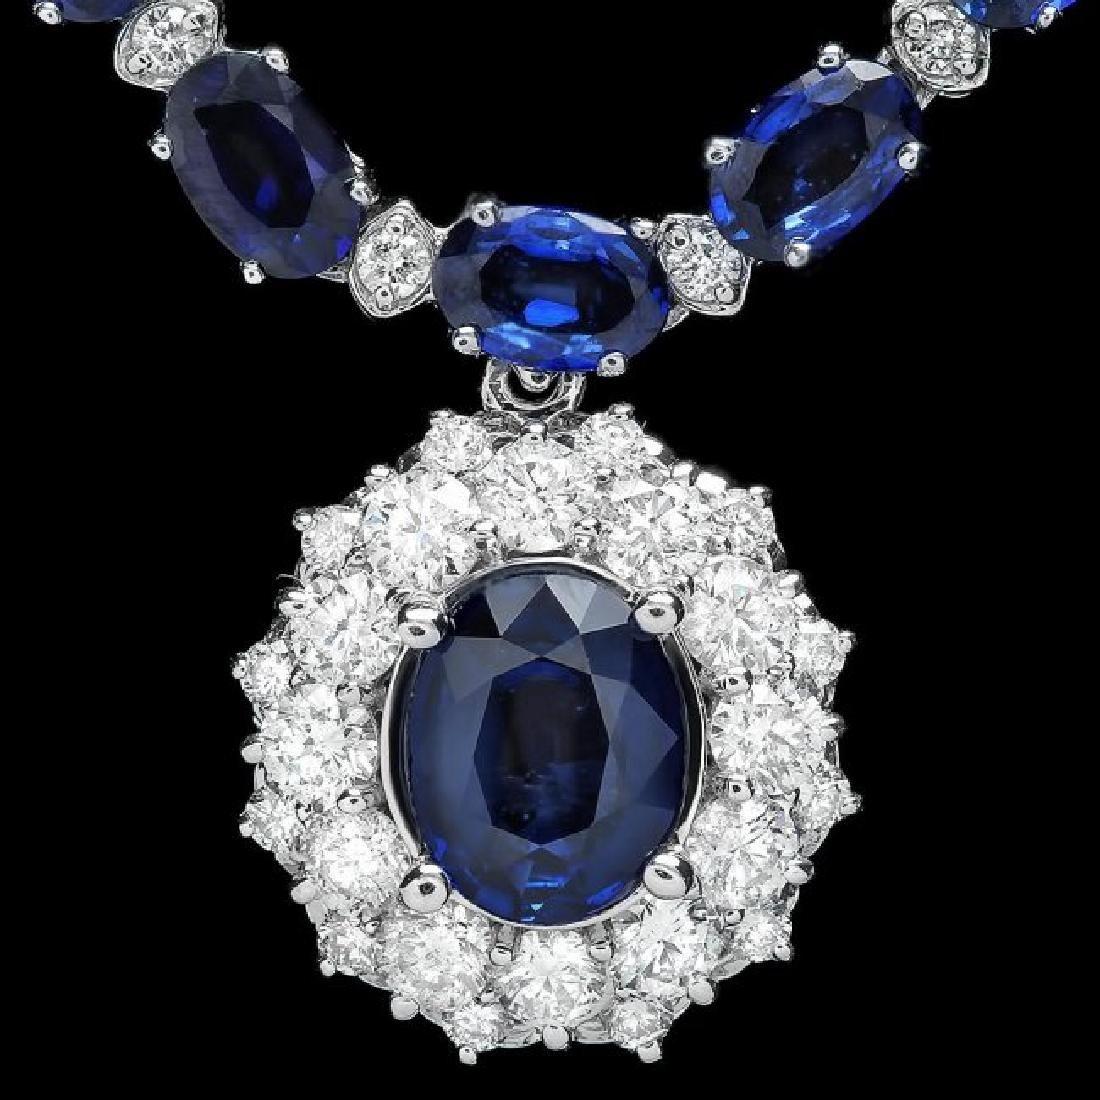 14k Gold 28ct Sapphire 3.35ct Diamond Necklace